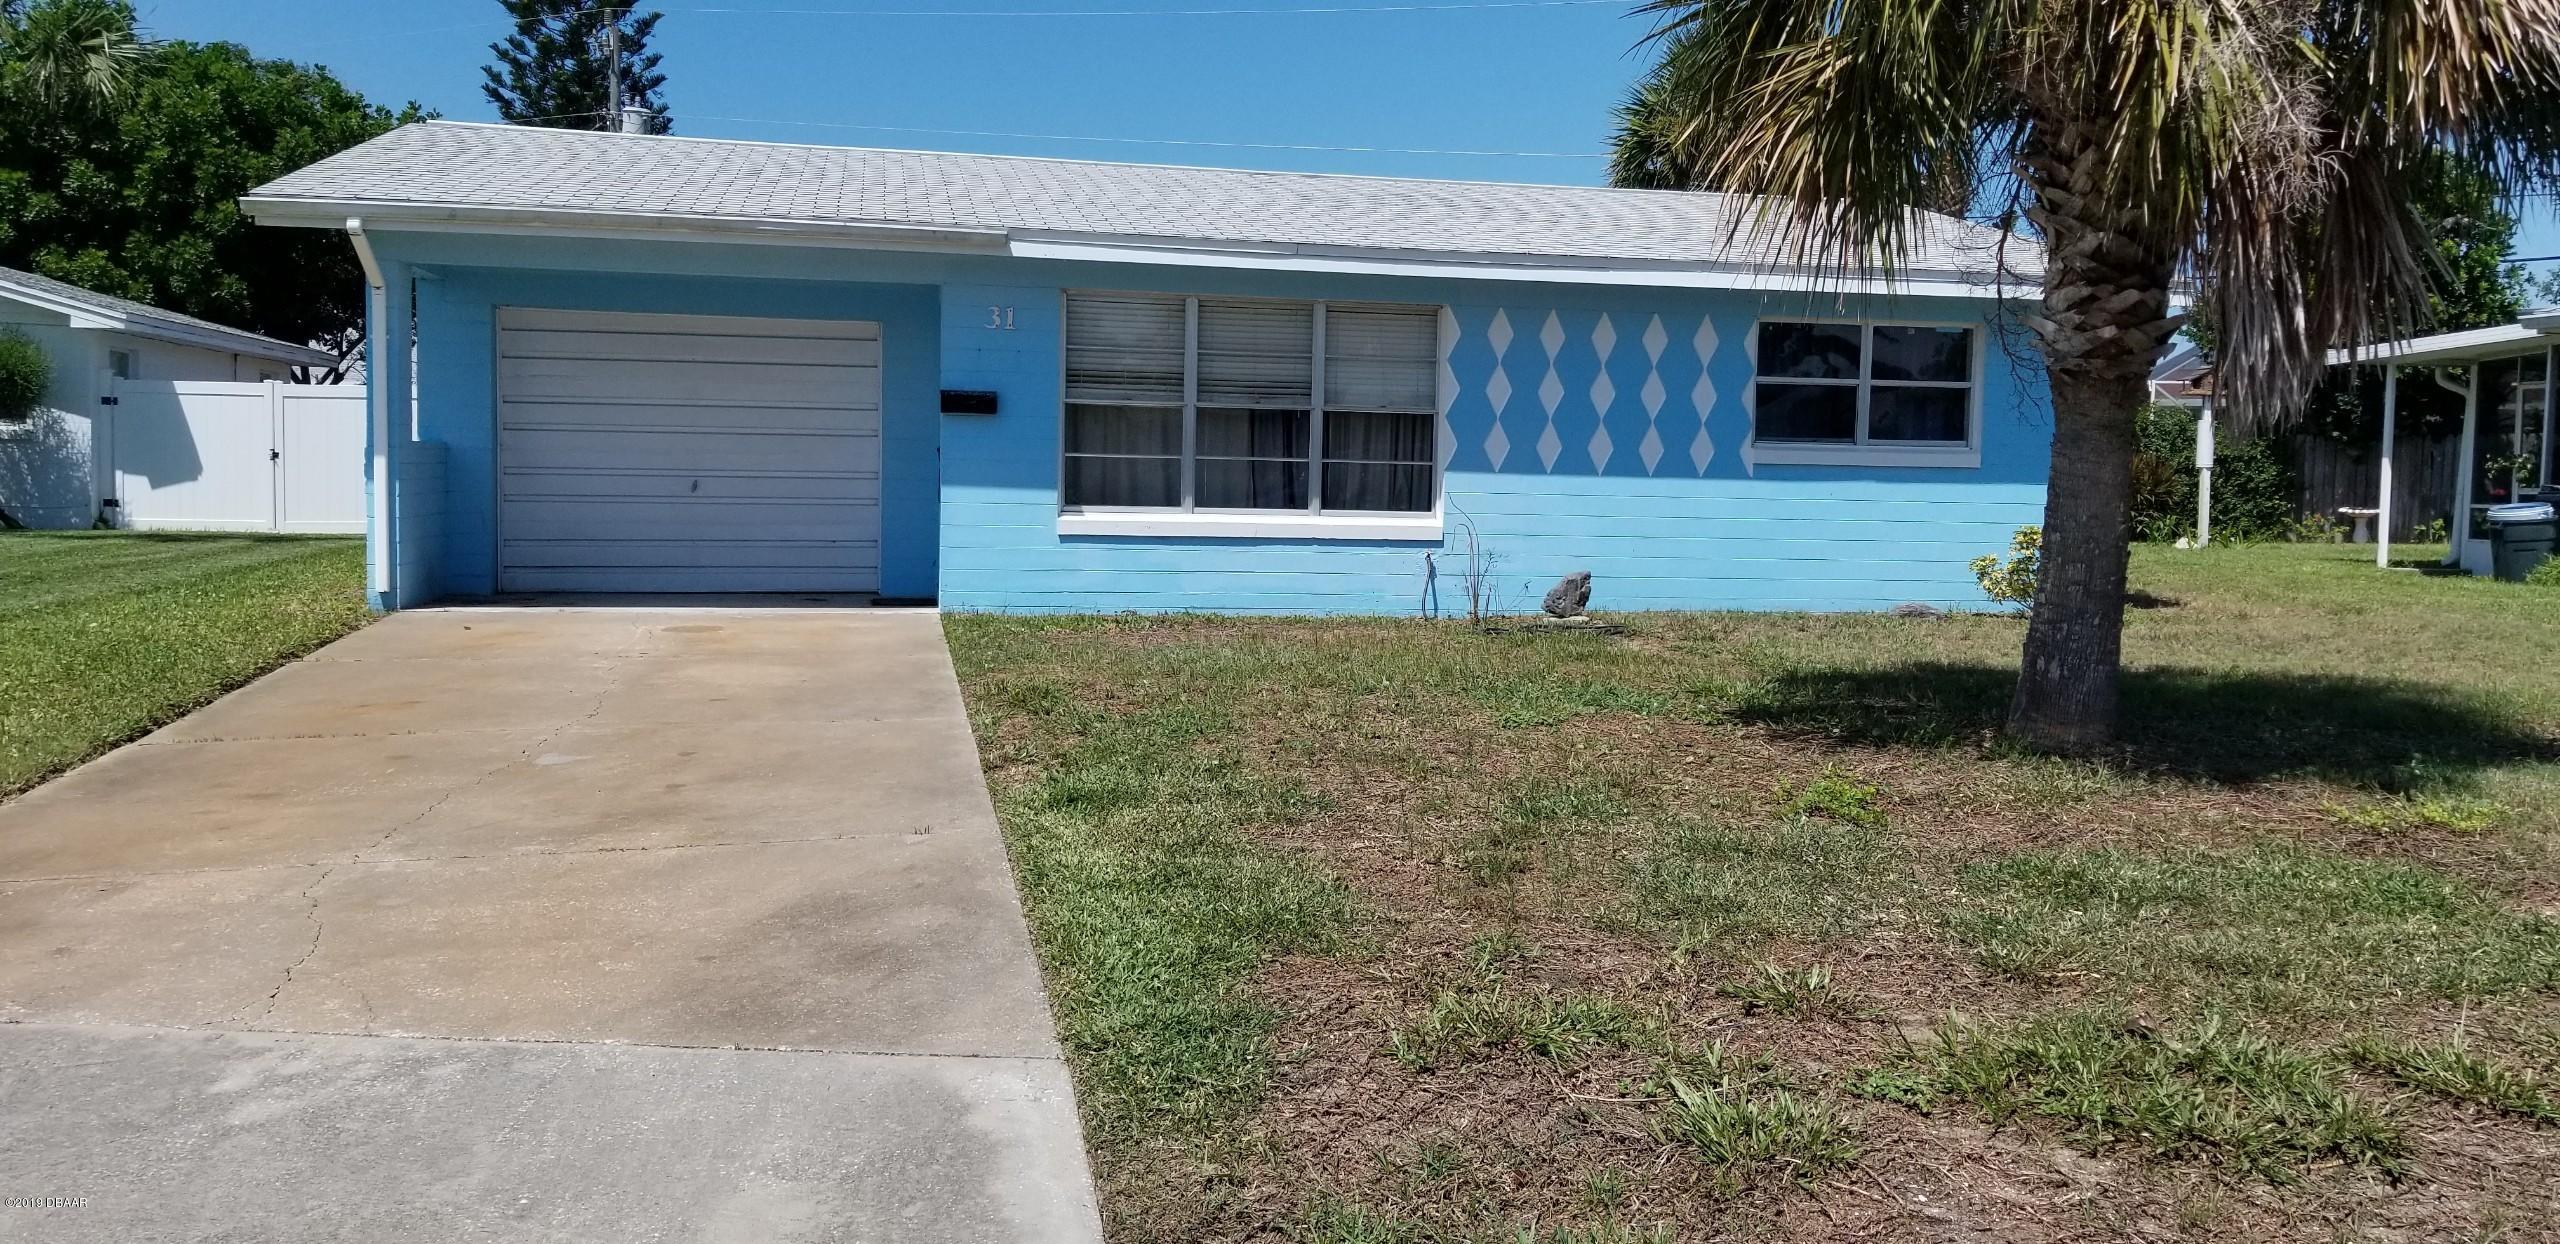 Photo of 31 Camellia Drive, Ormond Beach, FL 32176